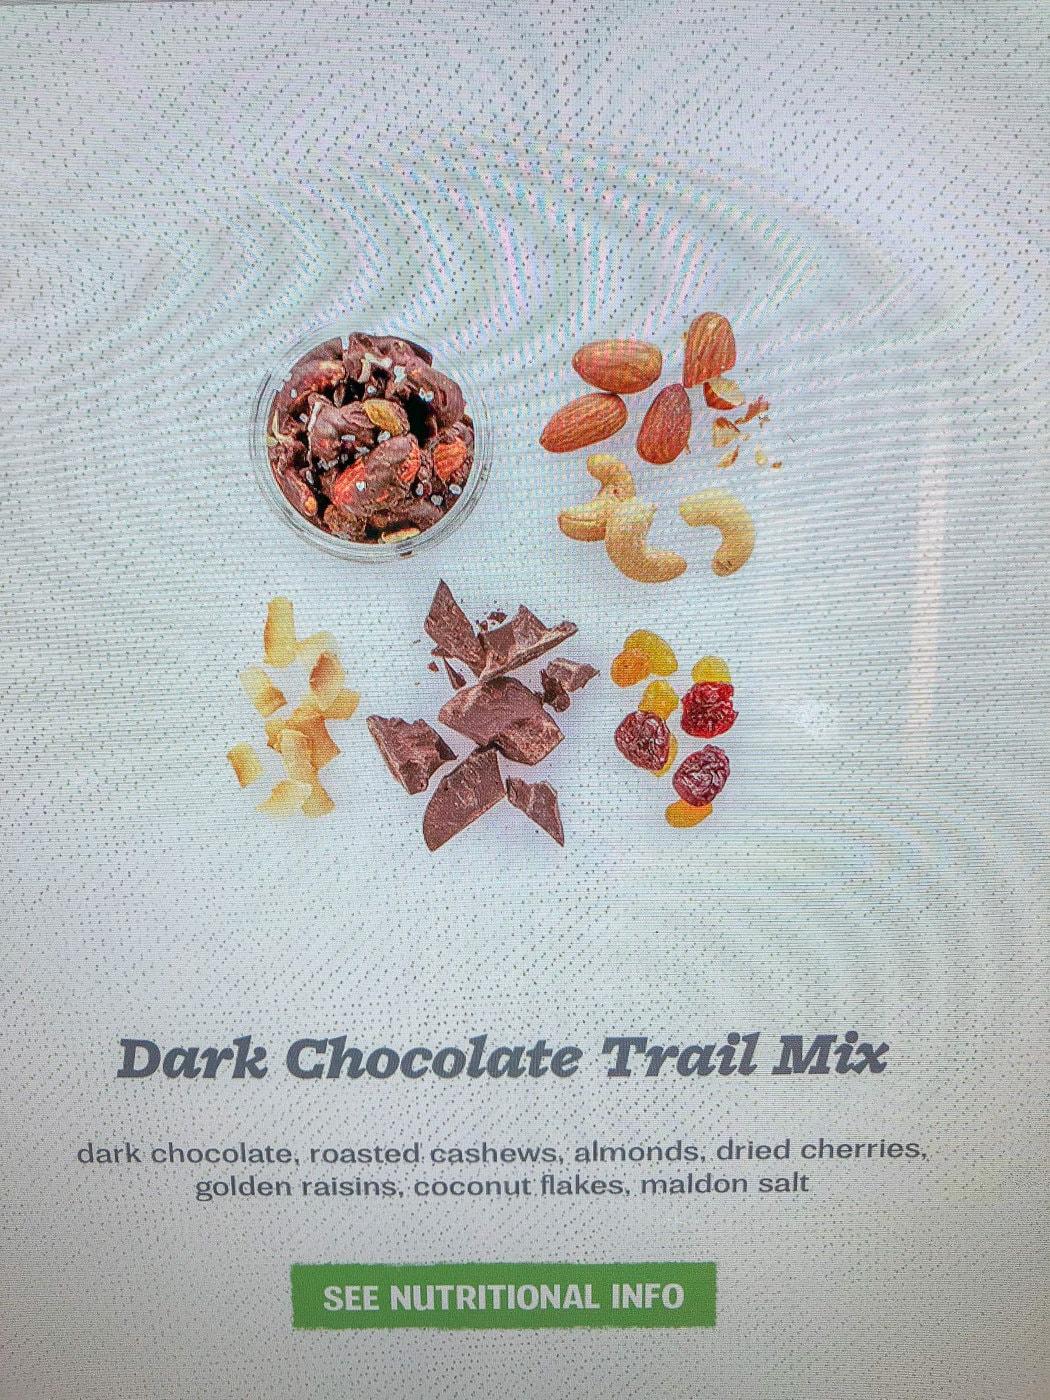 Farmers Fridge Trail Mix Ingredient Image